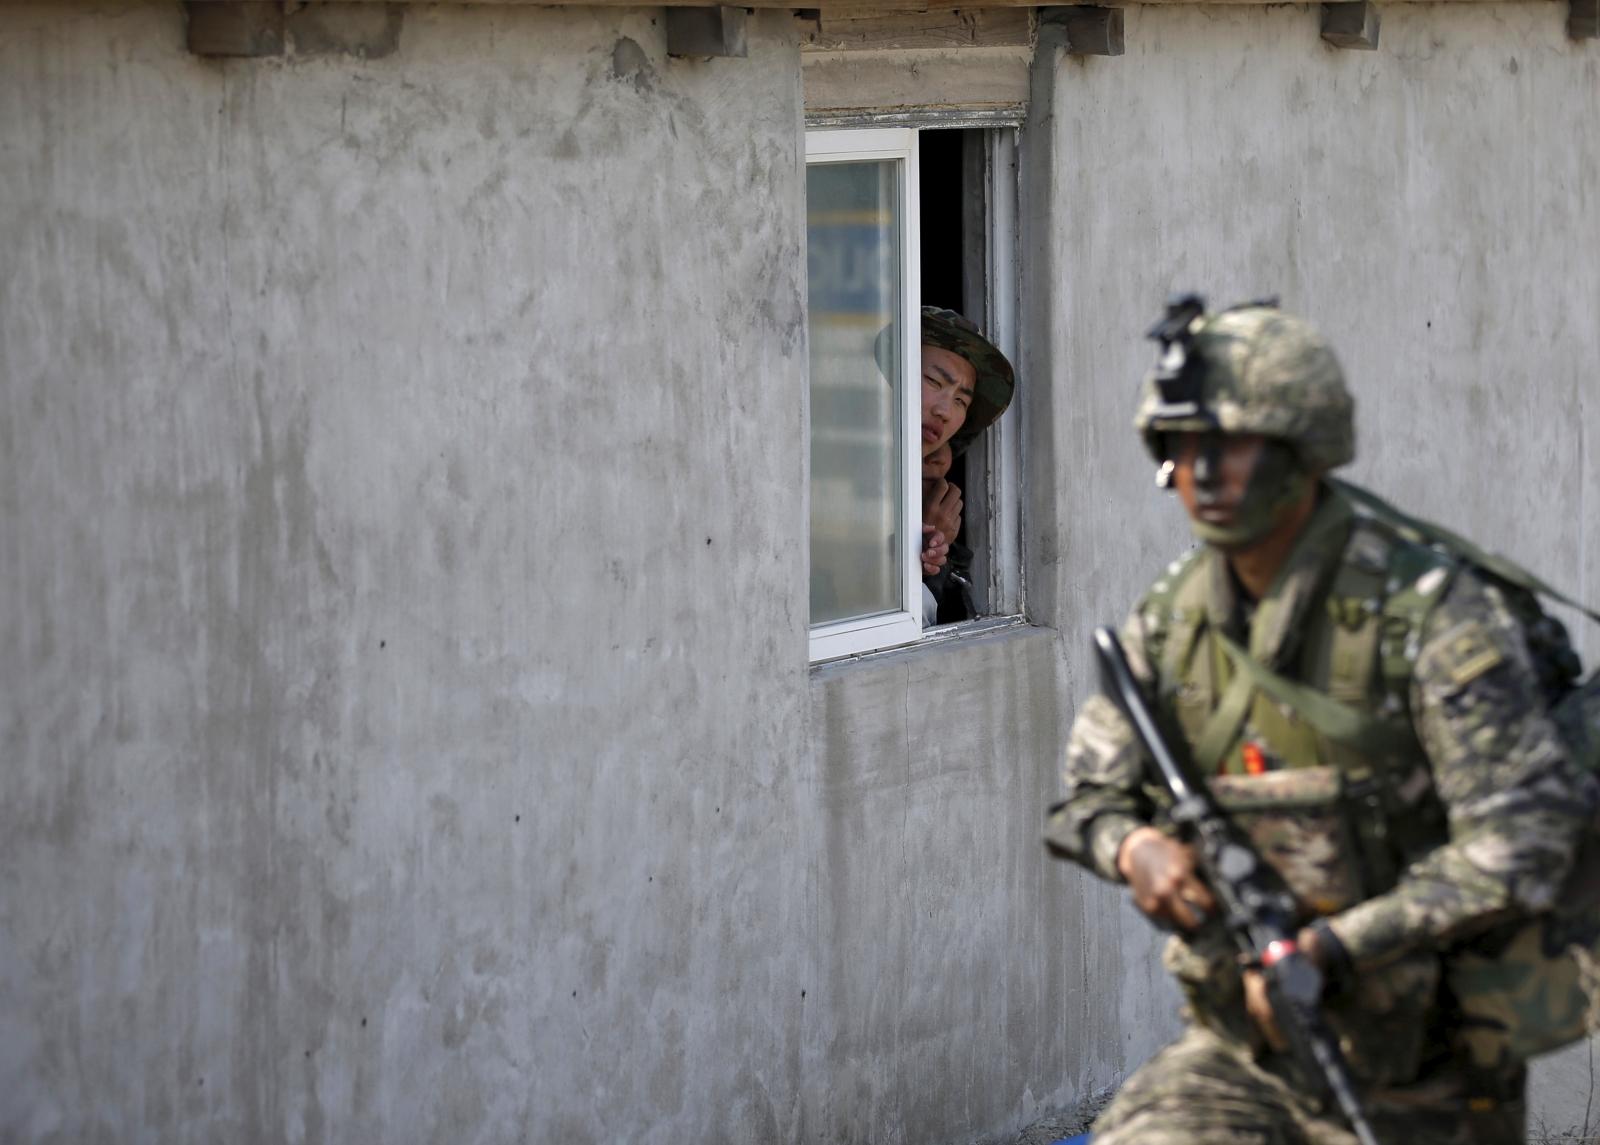 South Korea rogue soldier